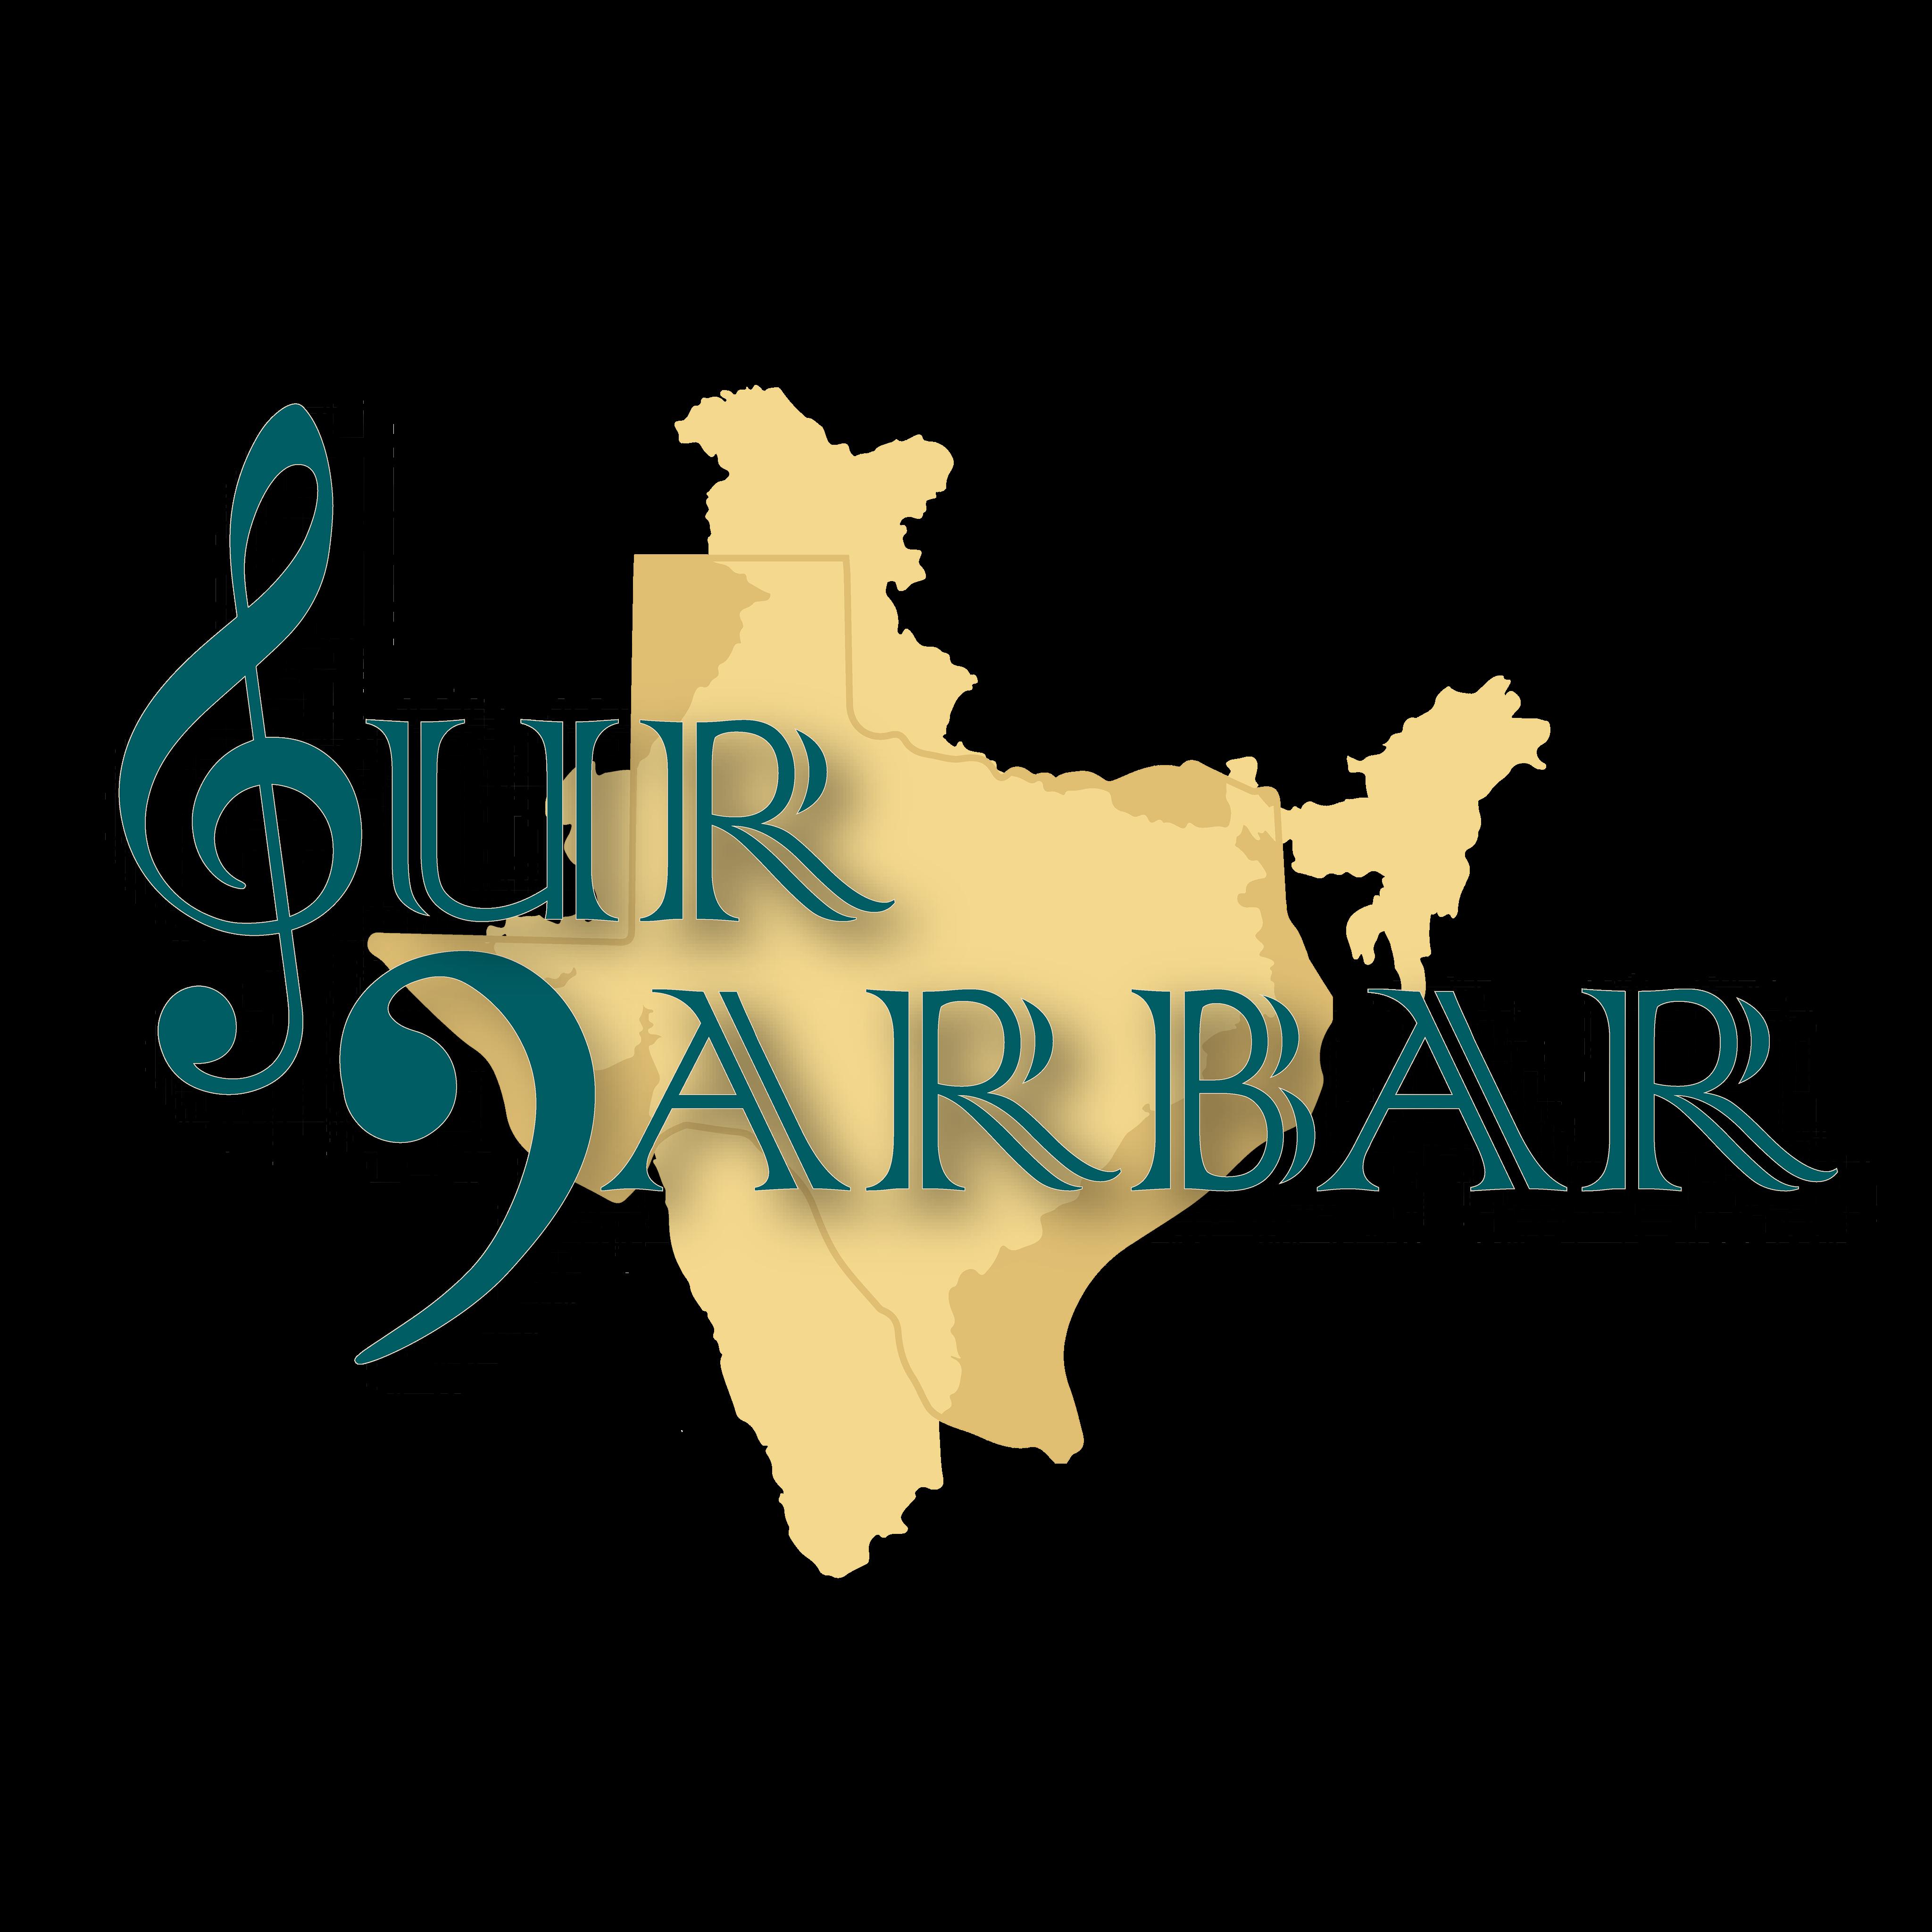 Sur Darbar